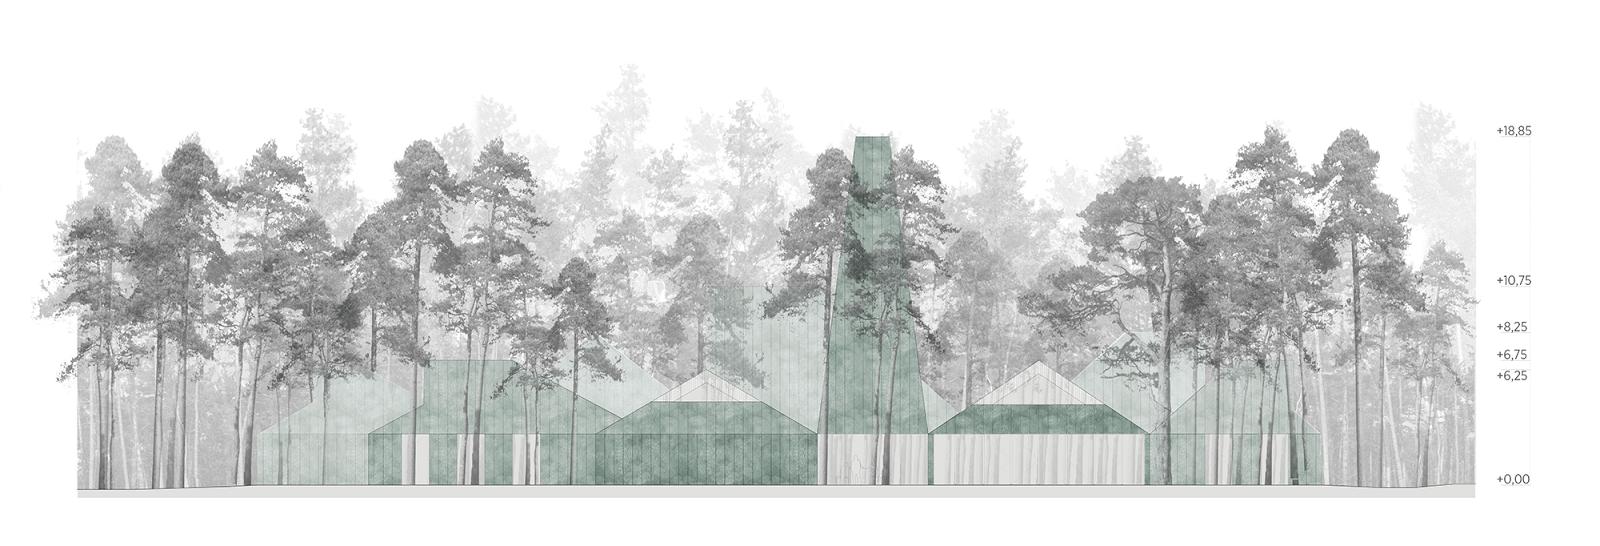 AZPML /// Arvo Pärt centre @ Laulasmaa, Estonie